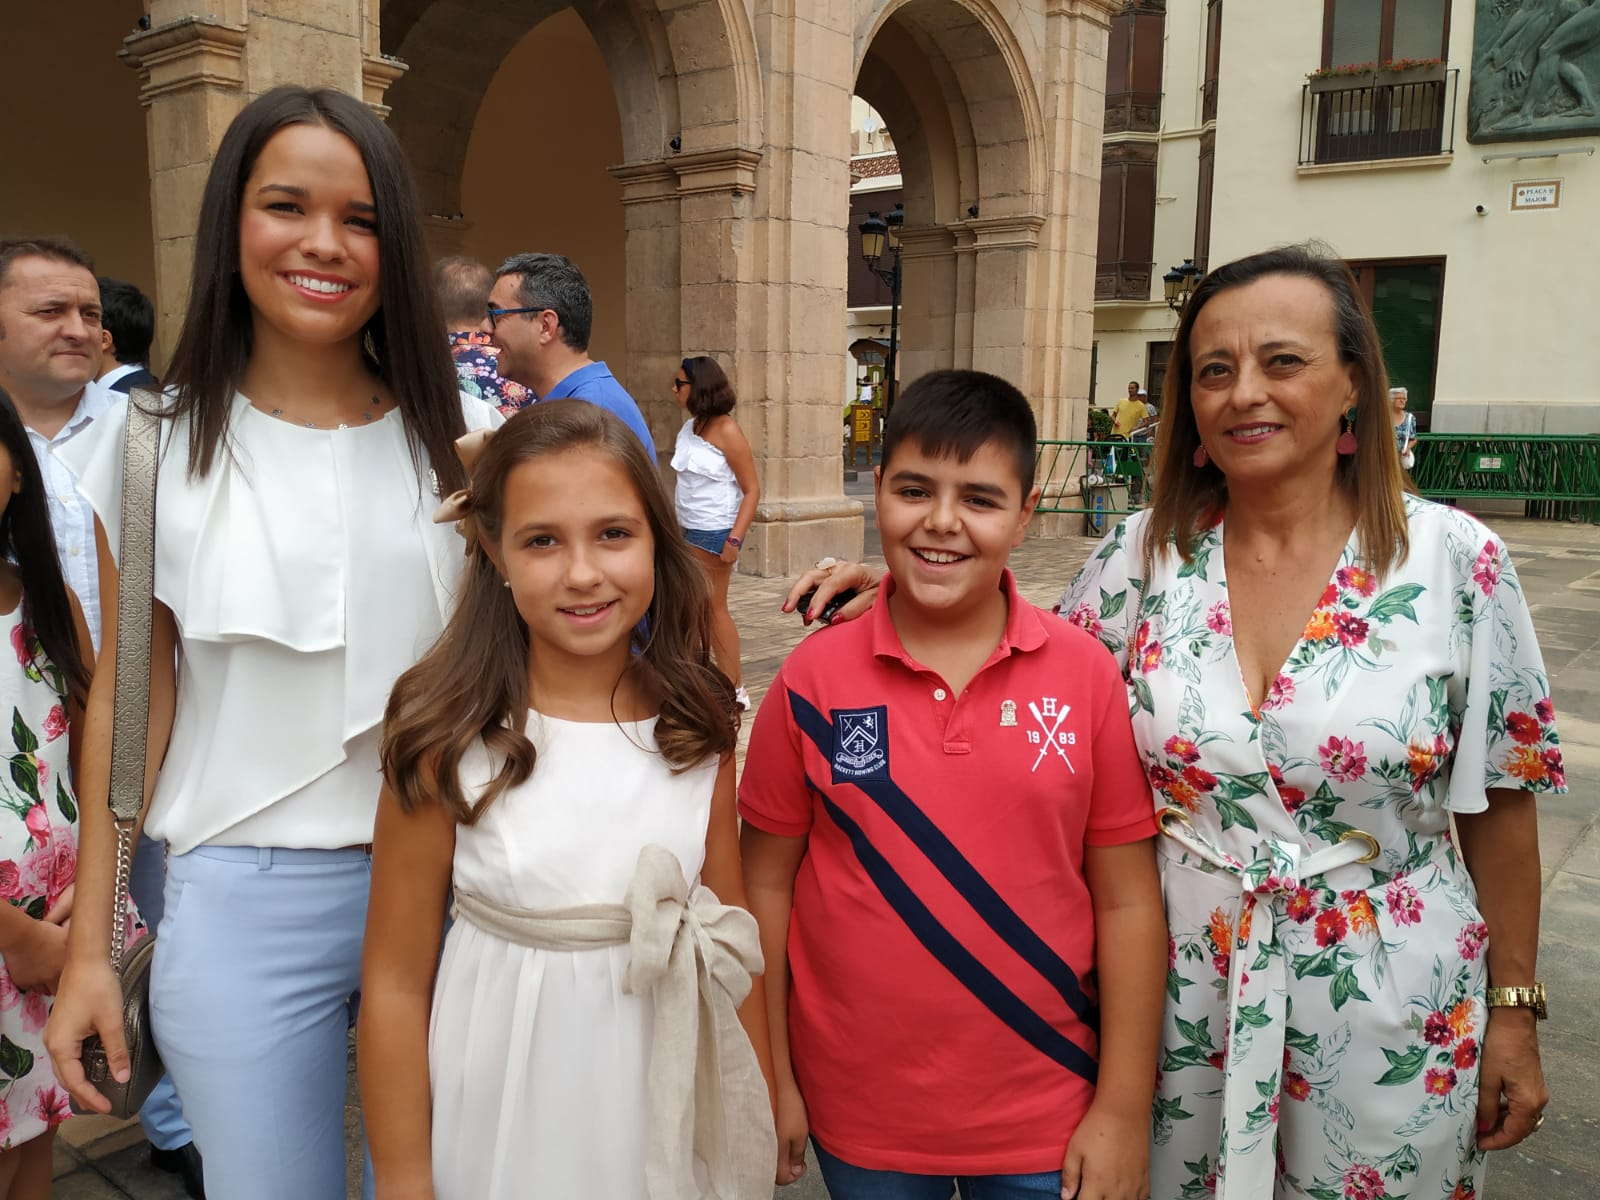 AniversariofundacionCastellon-2019-09-07-16-41-11(2)